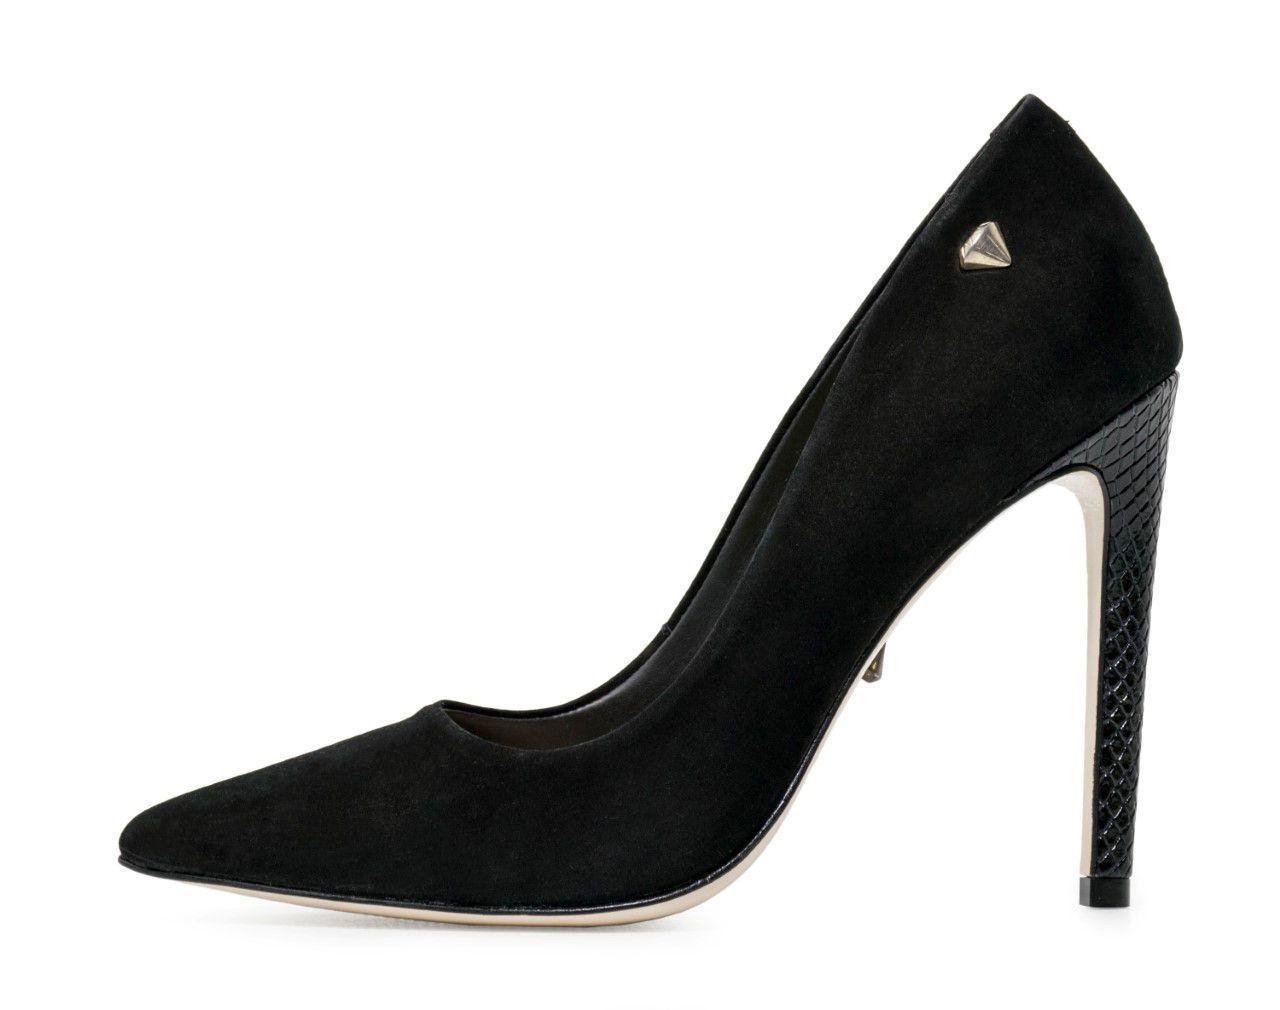 Scarpin Conceito Fashion Couro Nobuck Preto – Conceito Fashion